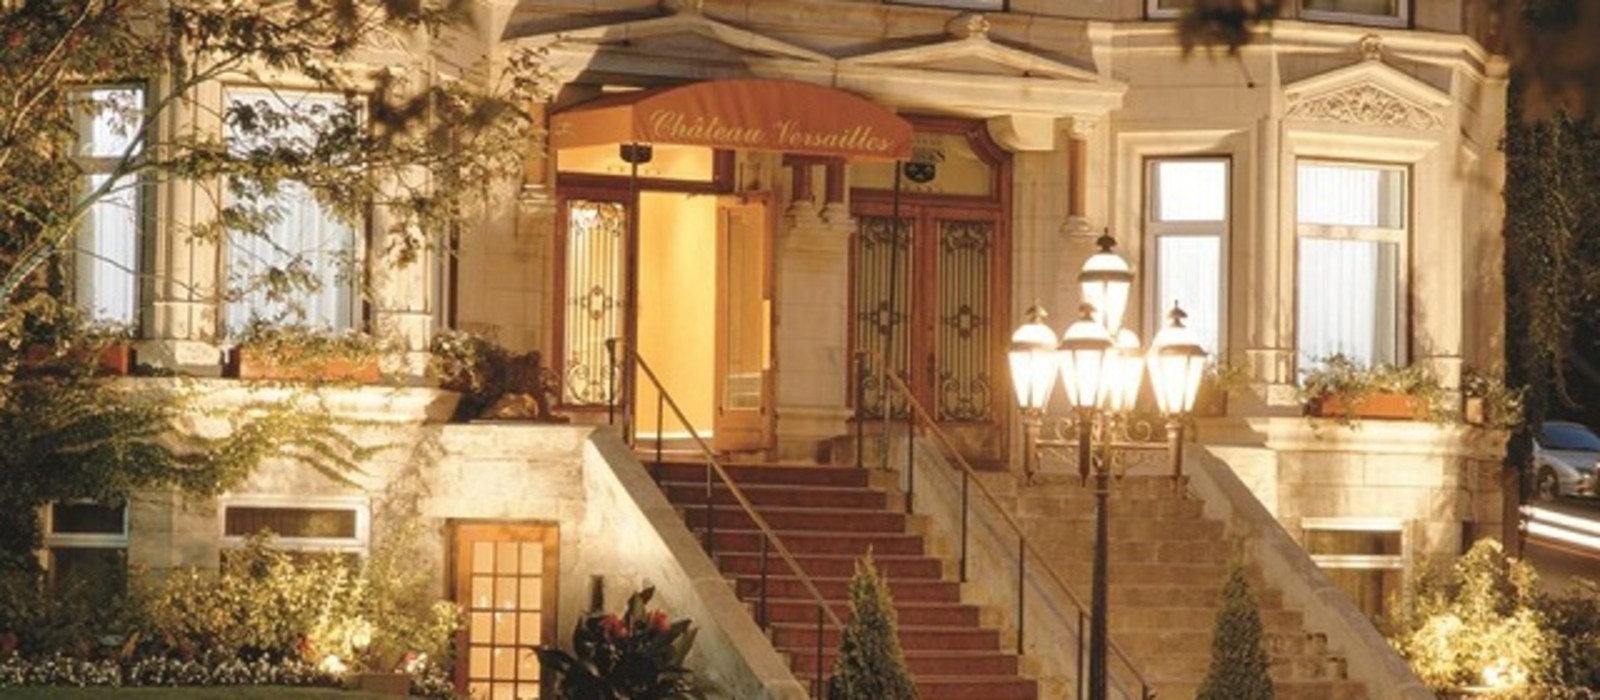 Hotel Chateau Versailles Canada